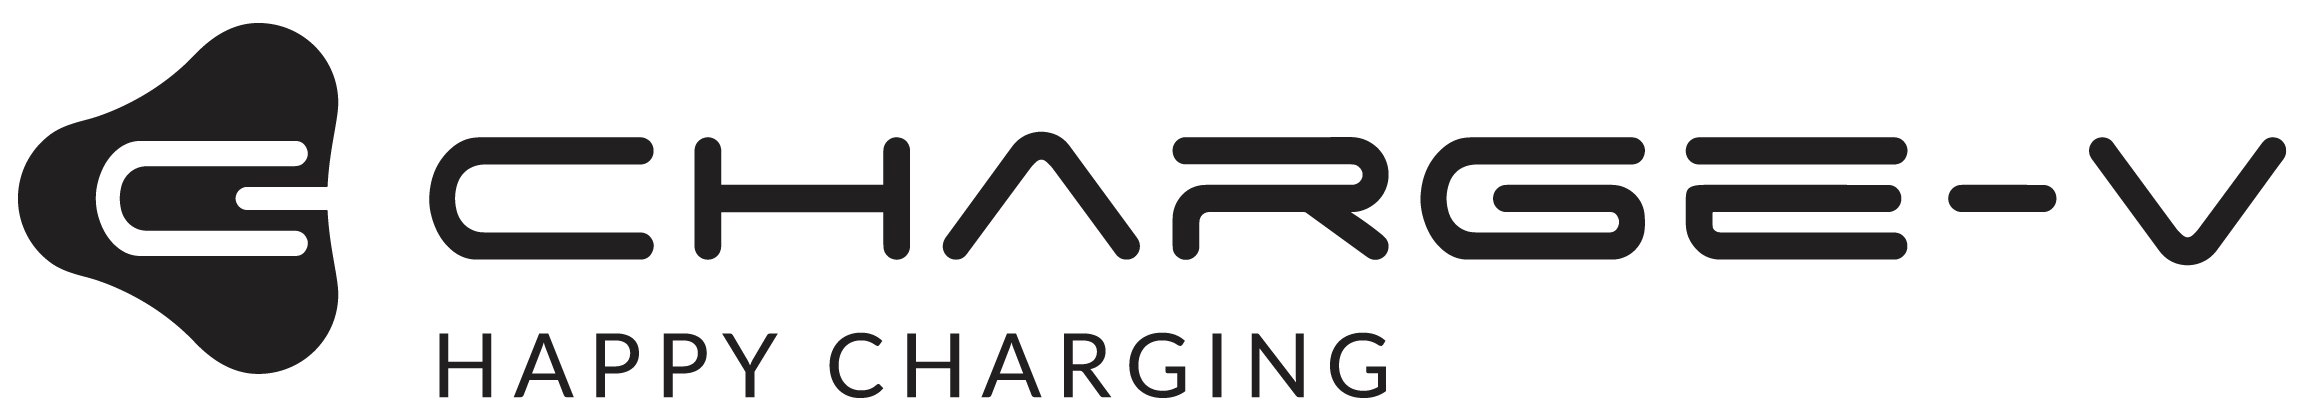 charge-v-logo-neu_black_claim-1